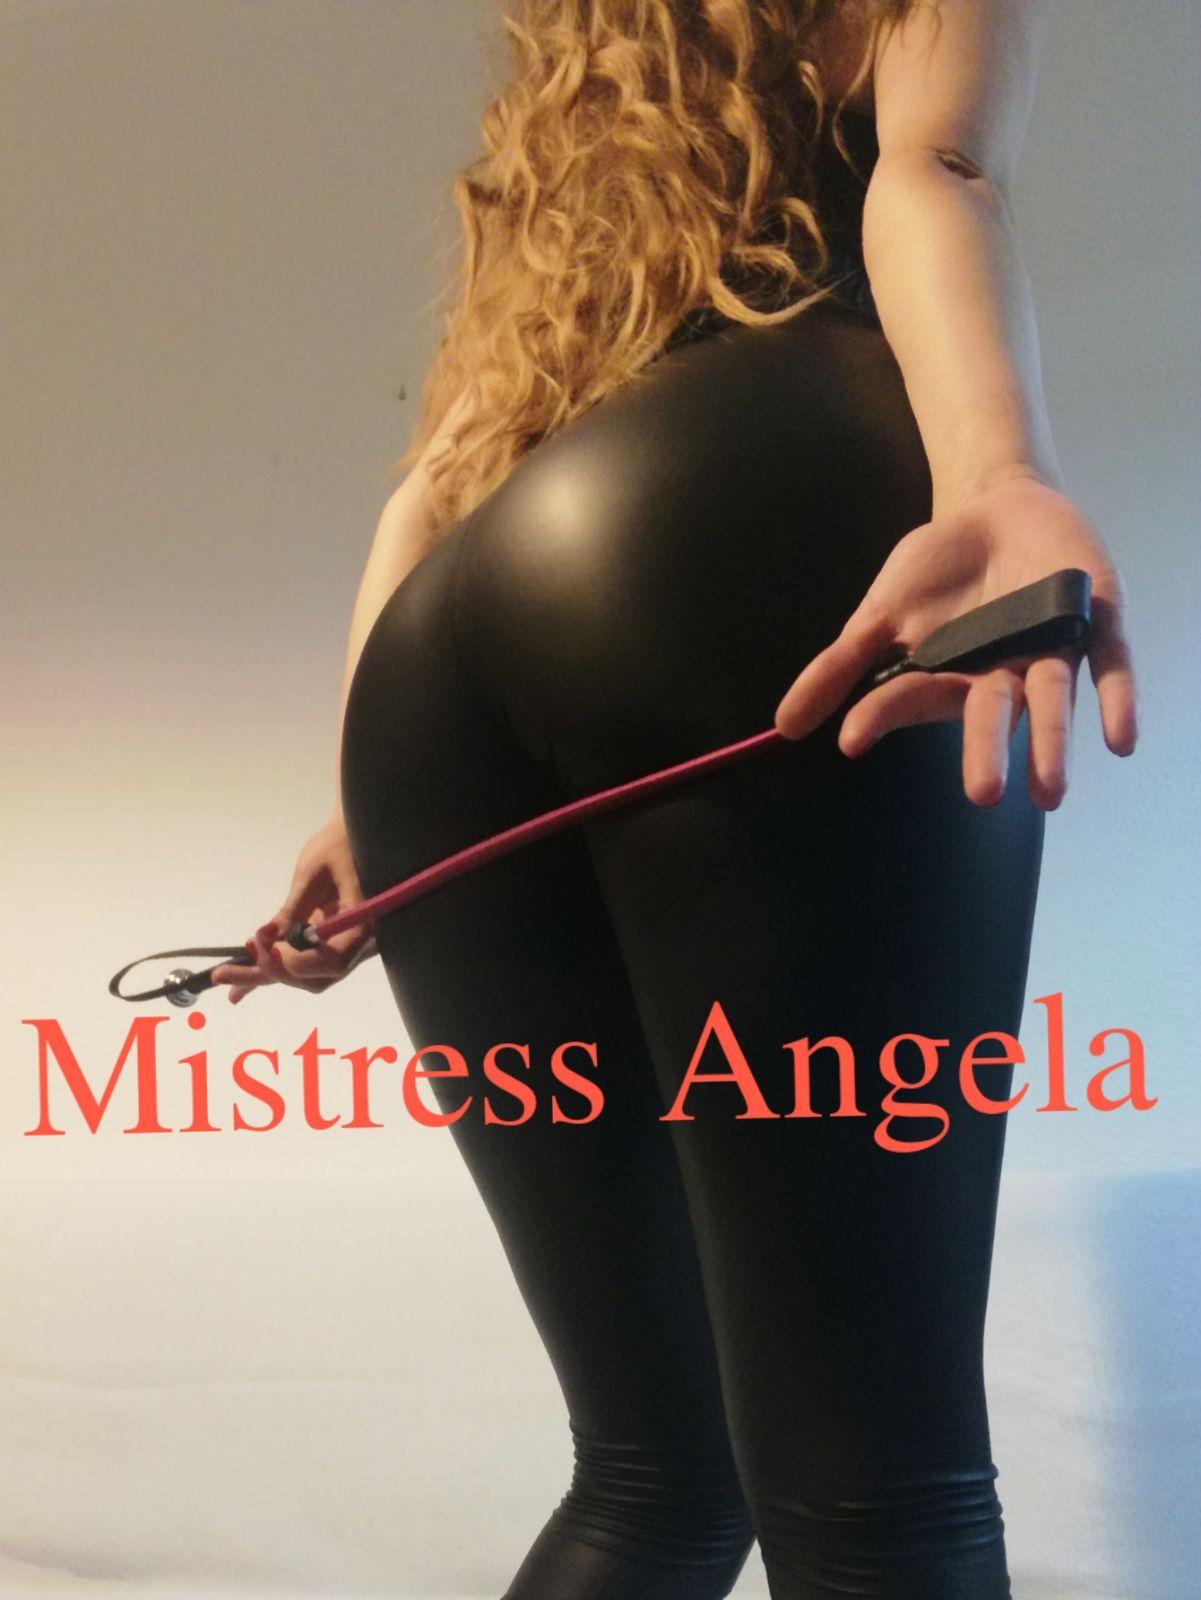 Mistress Angela